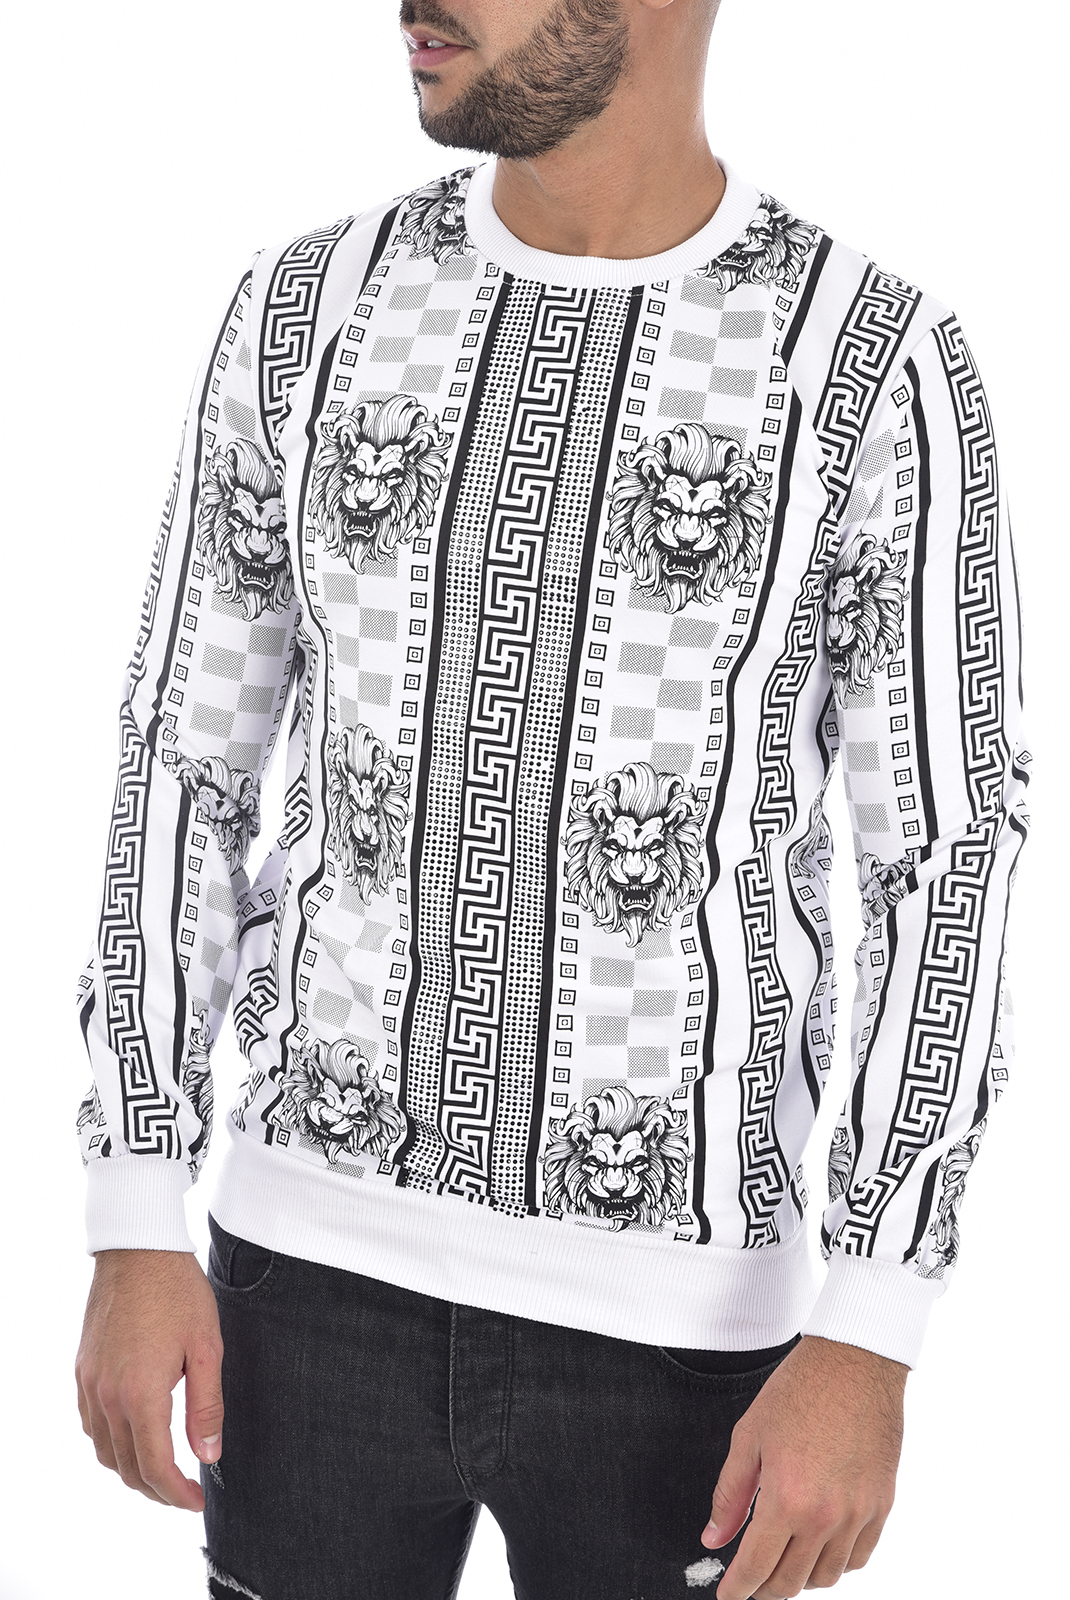 Sweatshirts  Goldenim paris 1240 BLANC